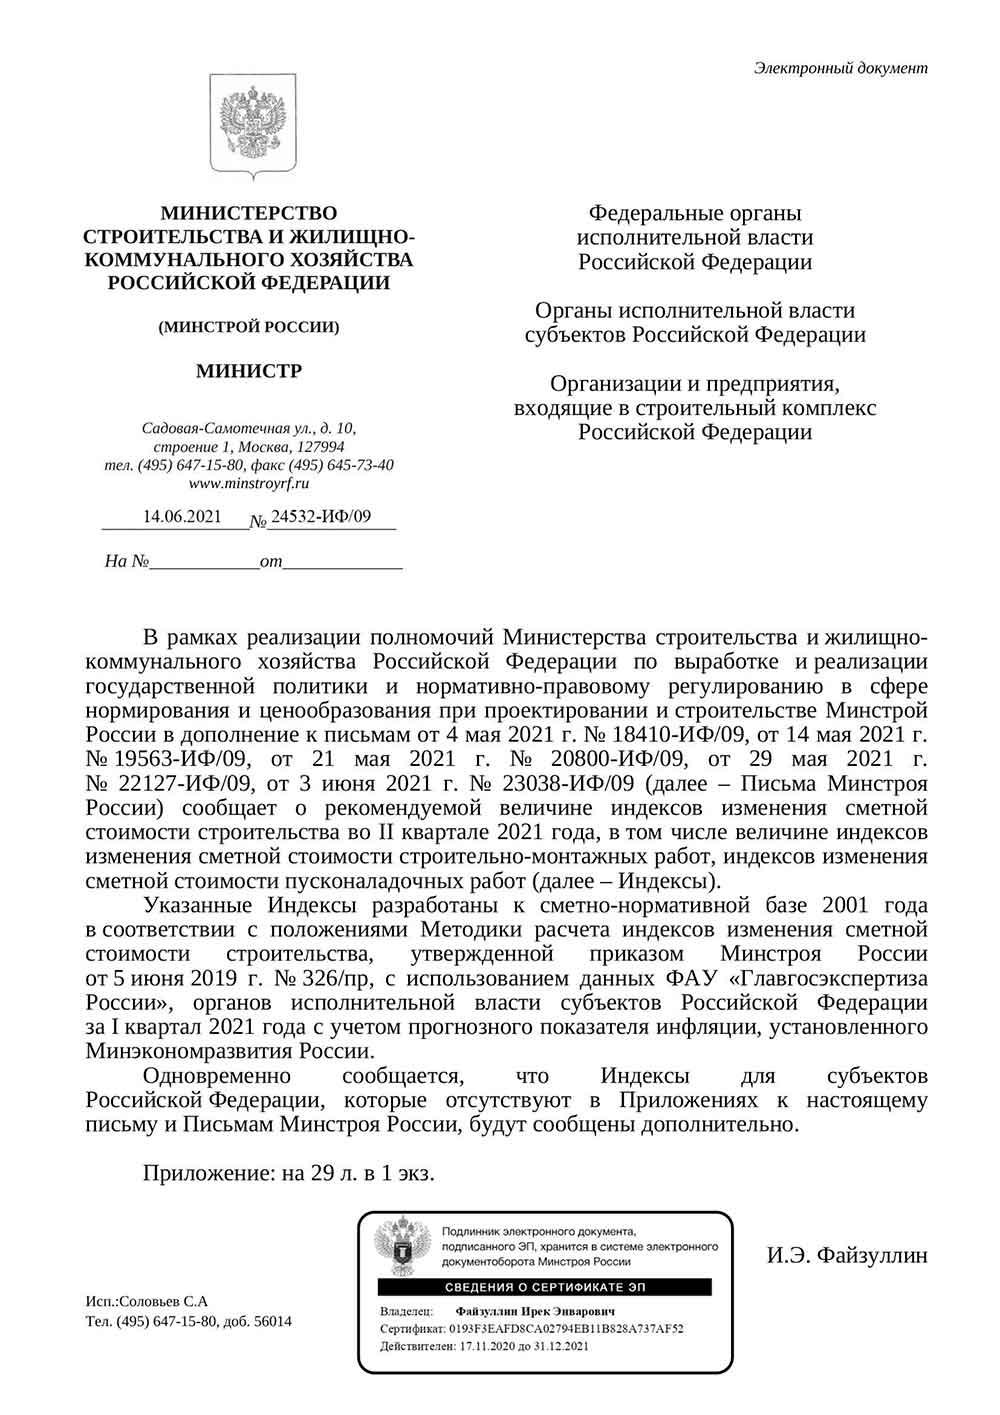 Письмо Минстроя РФ №24532-ИФ/09 от 14.06.2021 г.